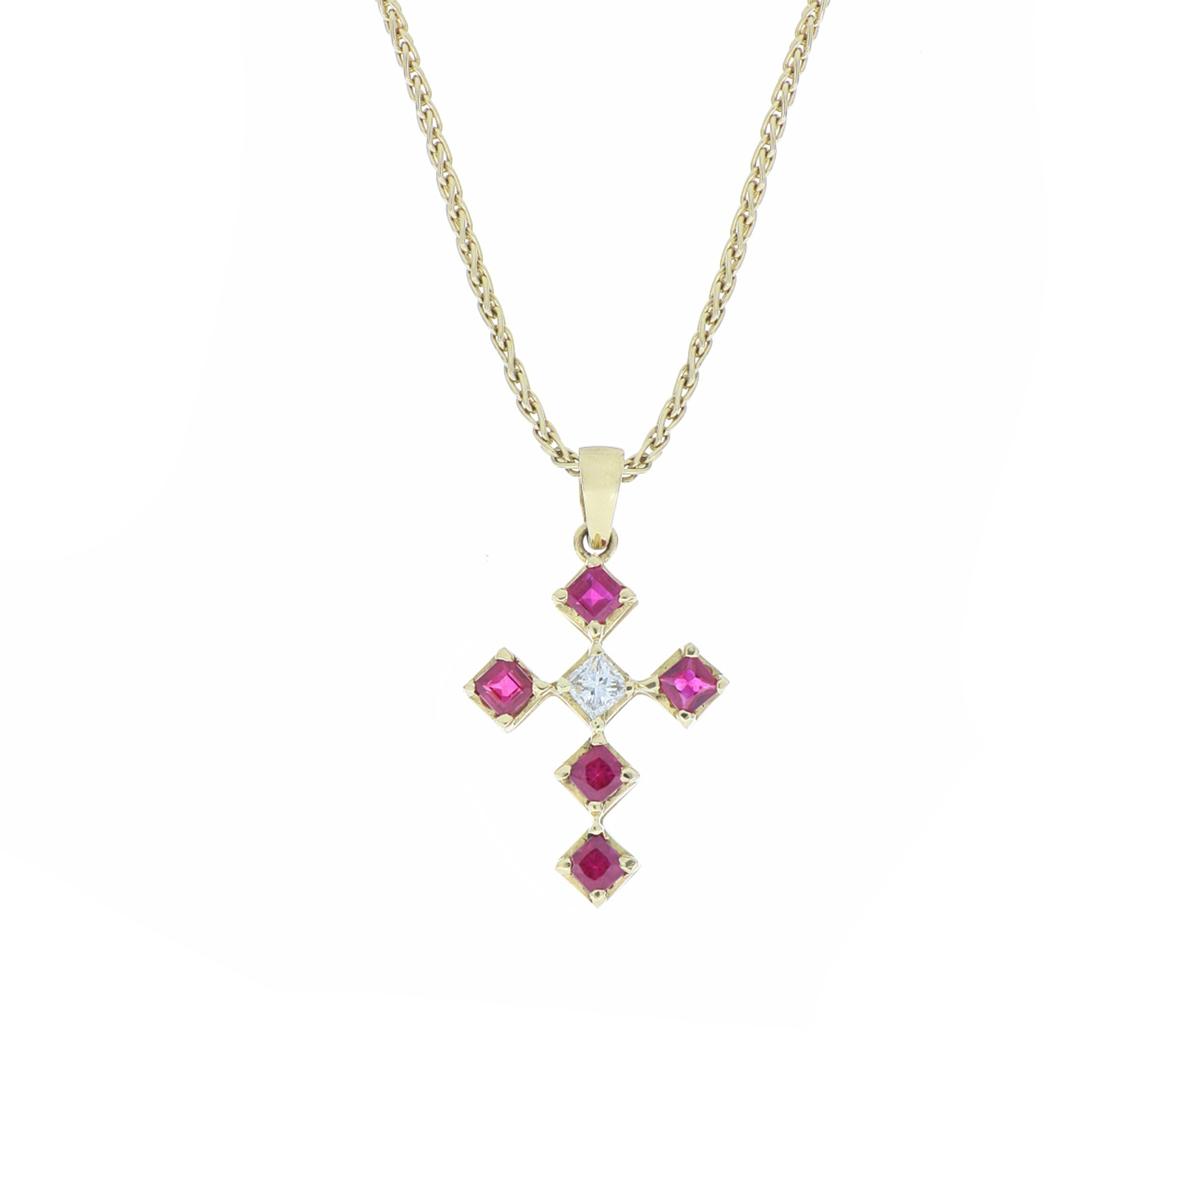 Square-Cut Ruby Cross Pendant Necklace